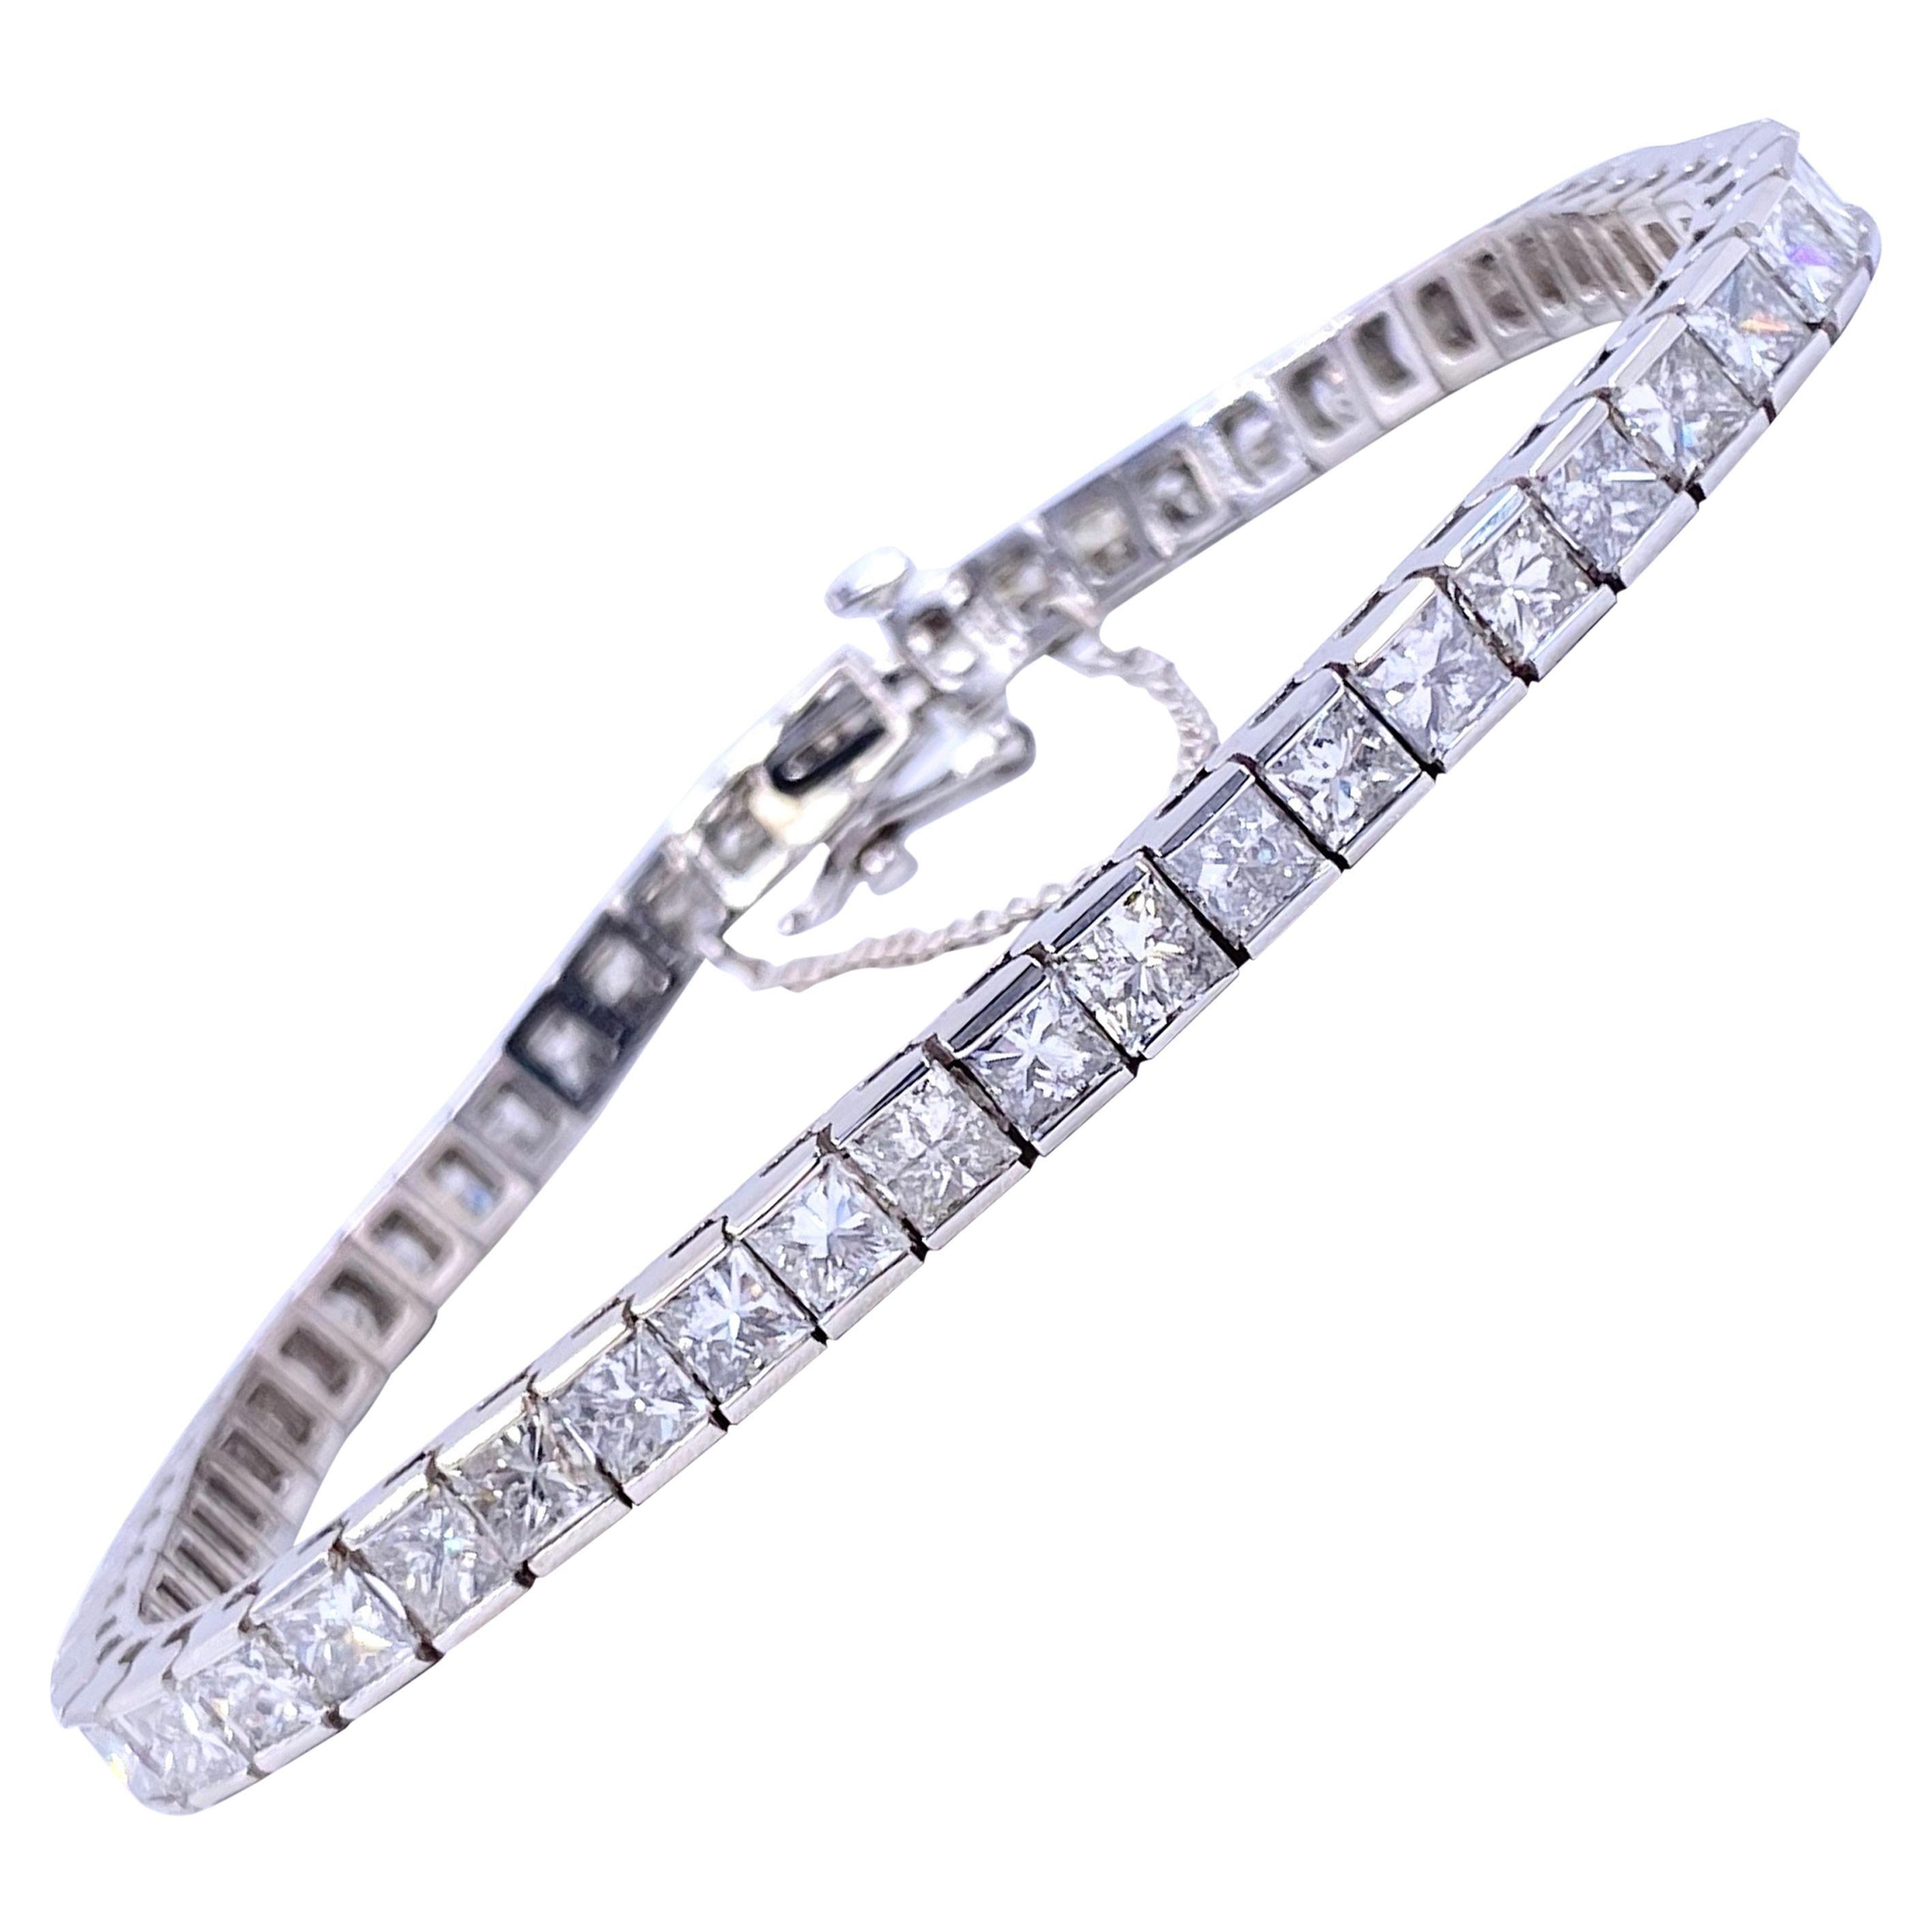 Princess Cut Diamond 12.00 Carat Tennis Bracelet 14 Karat White Gold